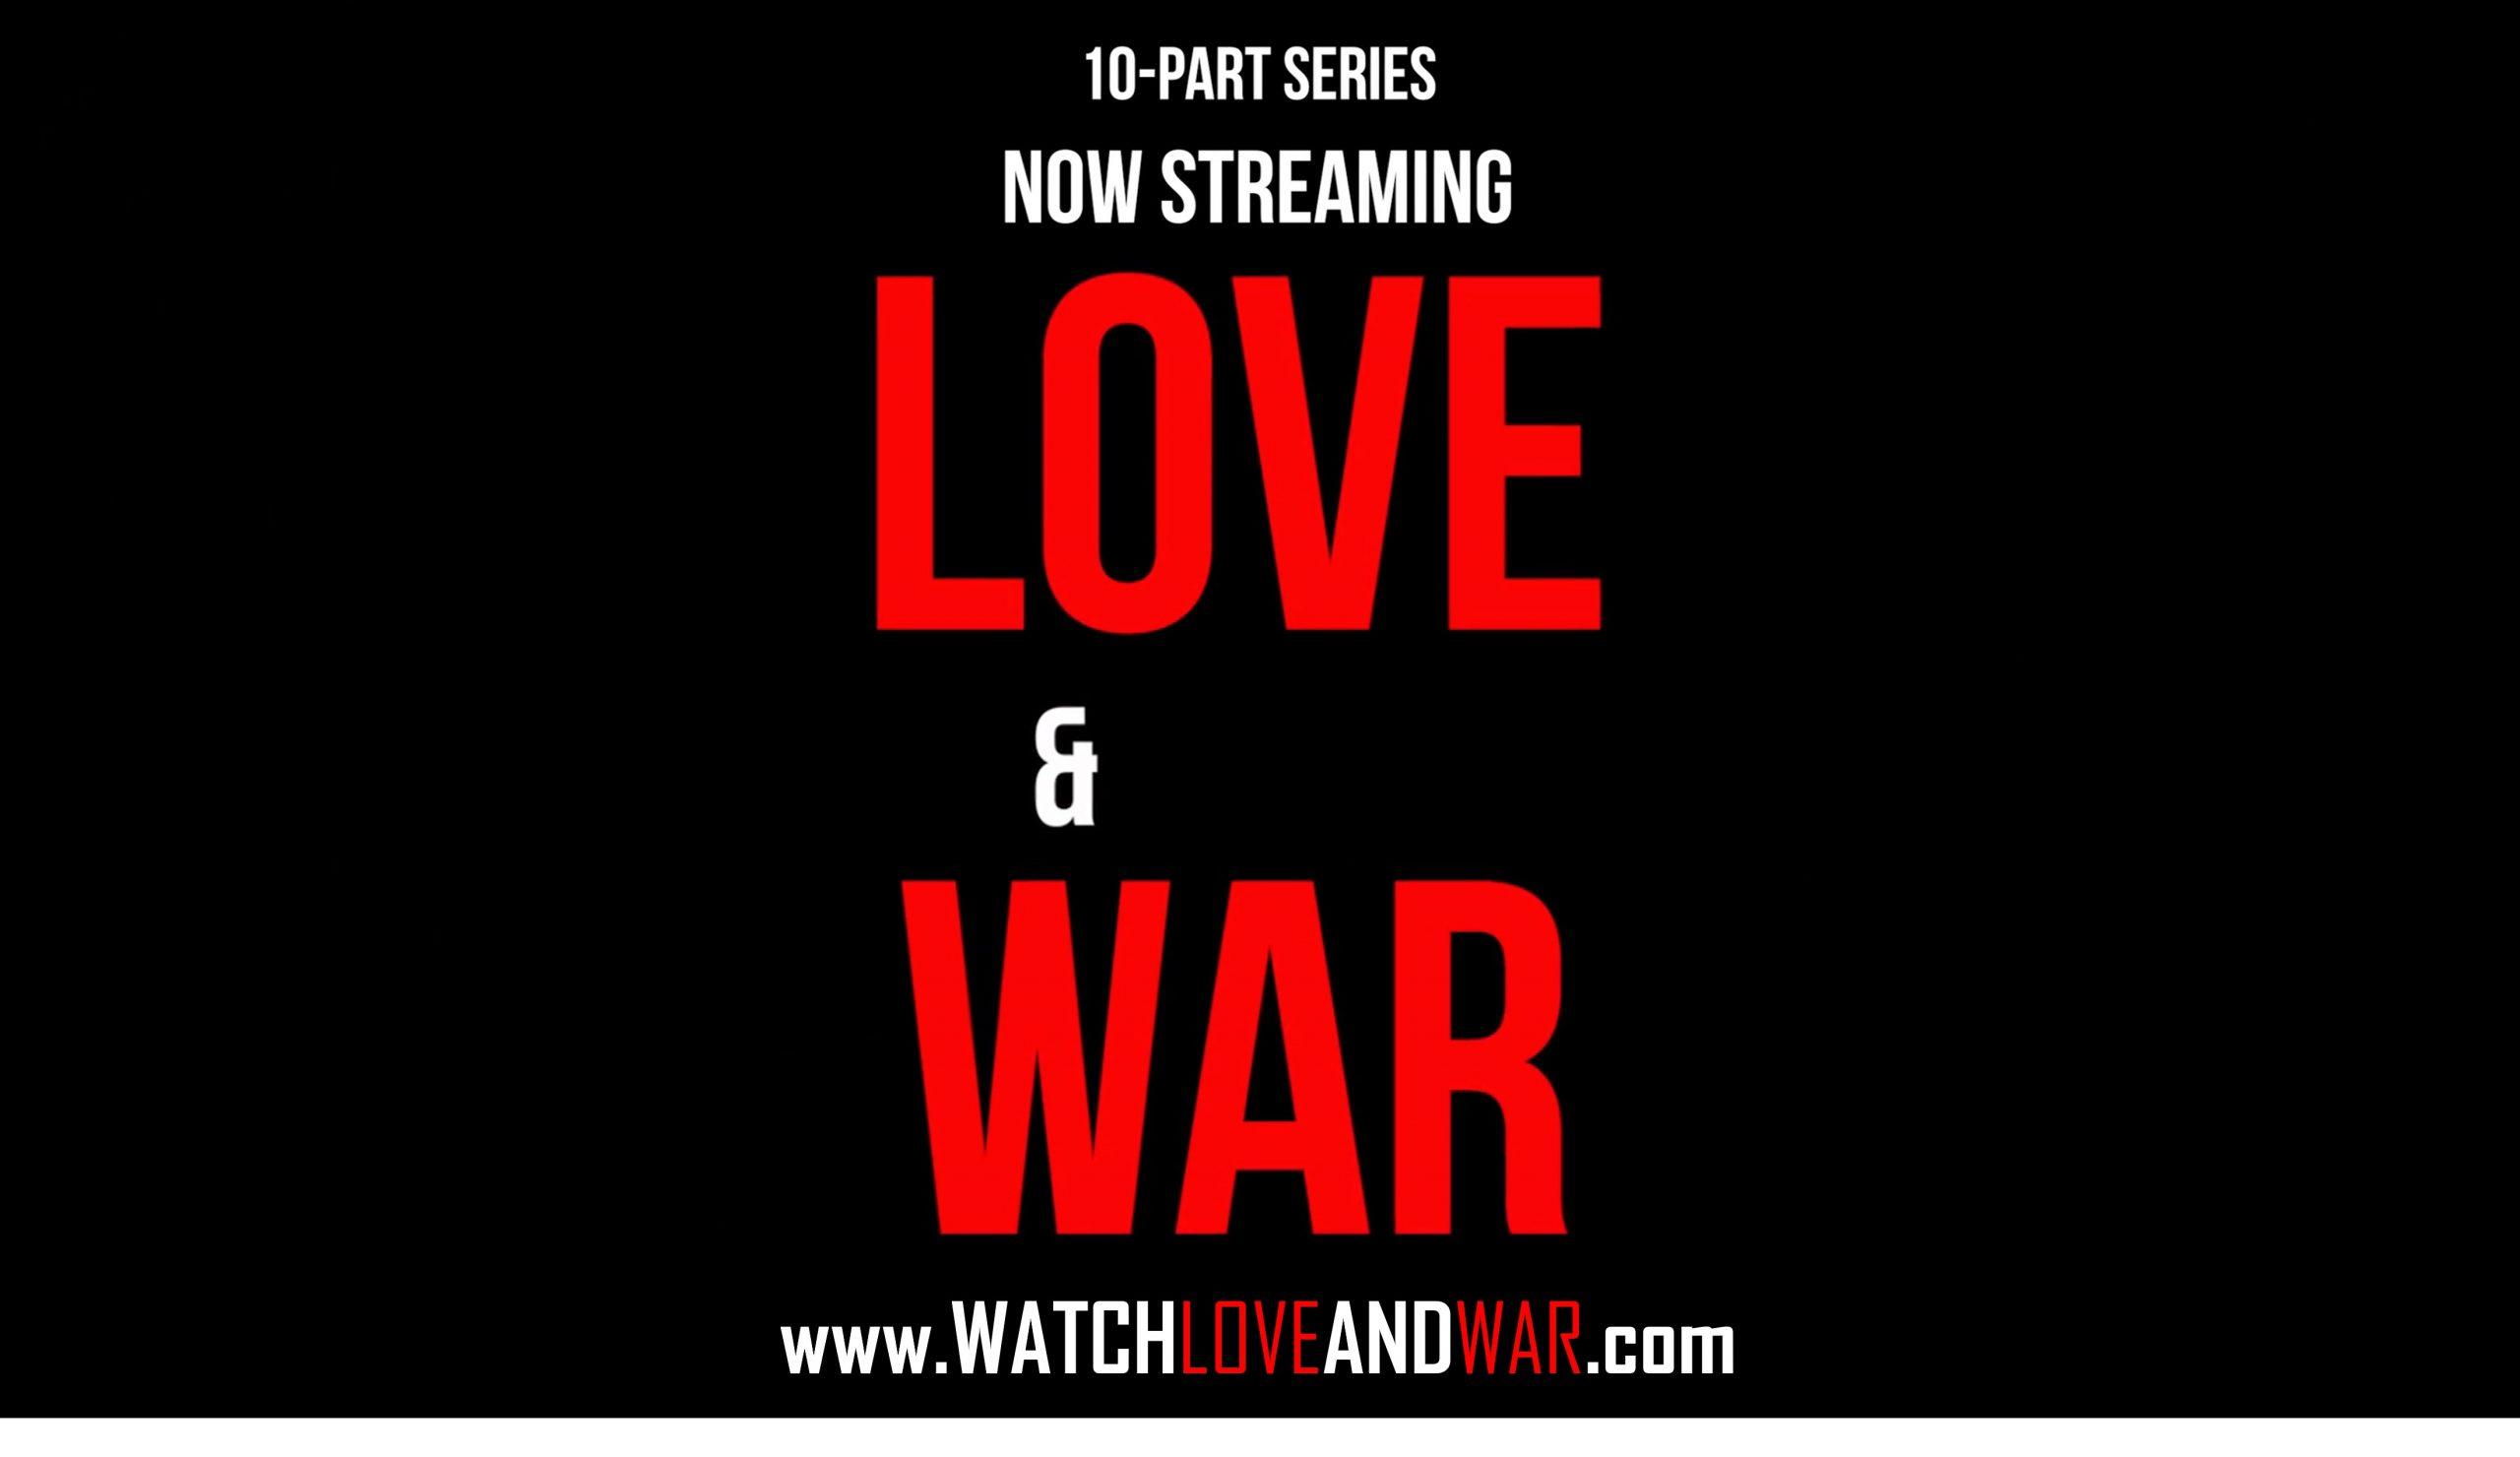 Love & War Streaming 10-Part Series